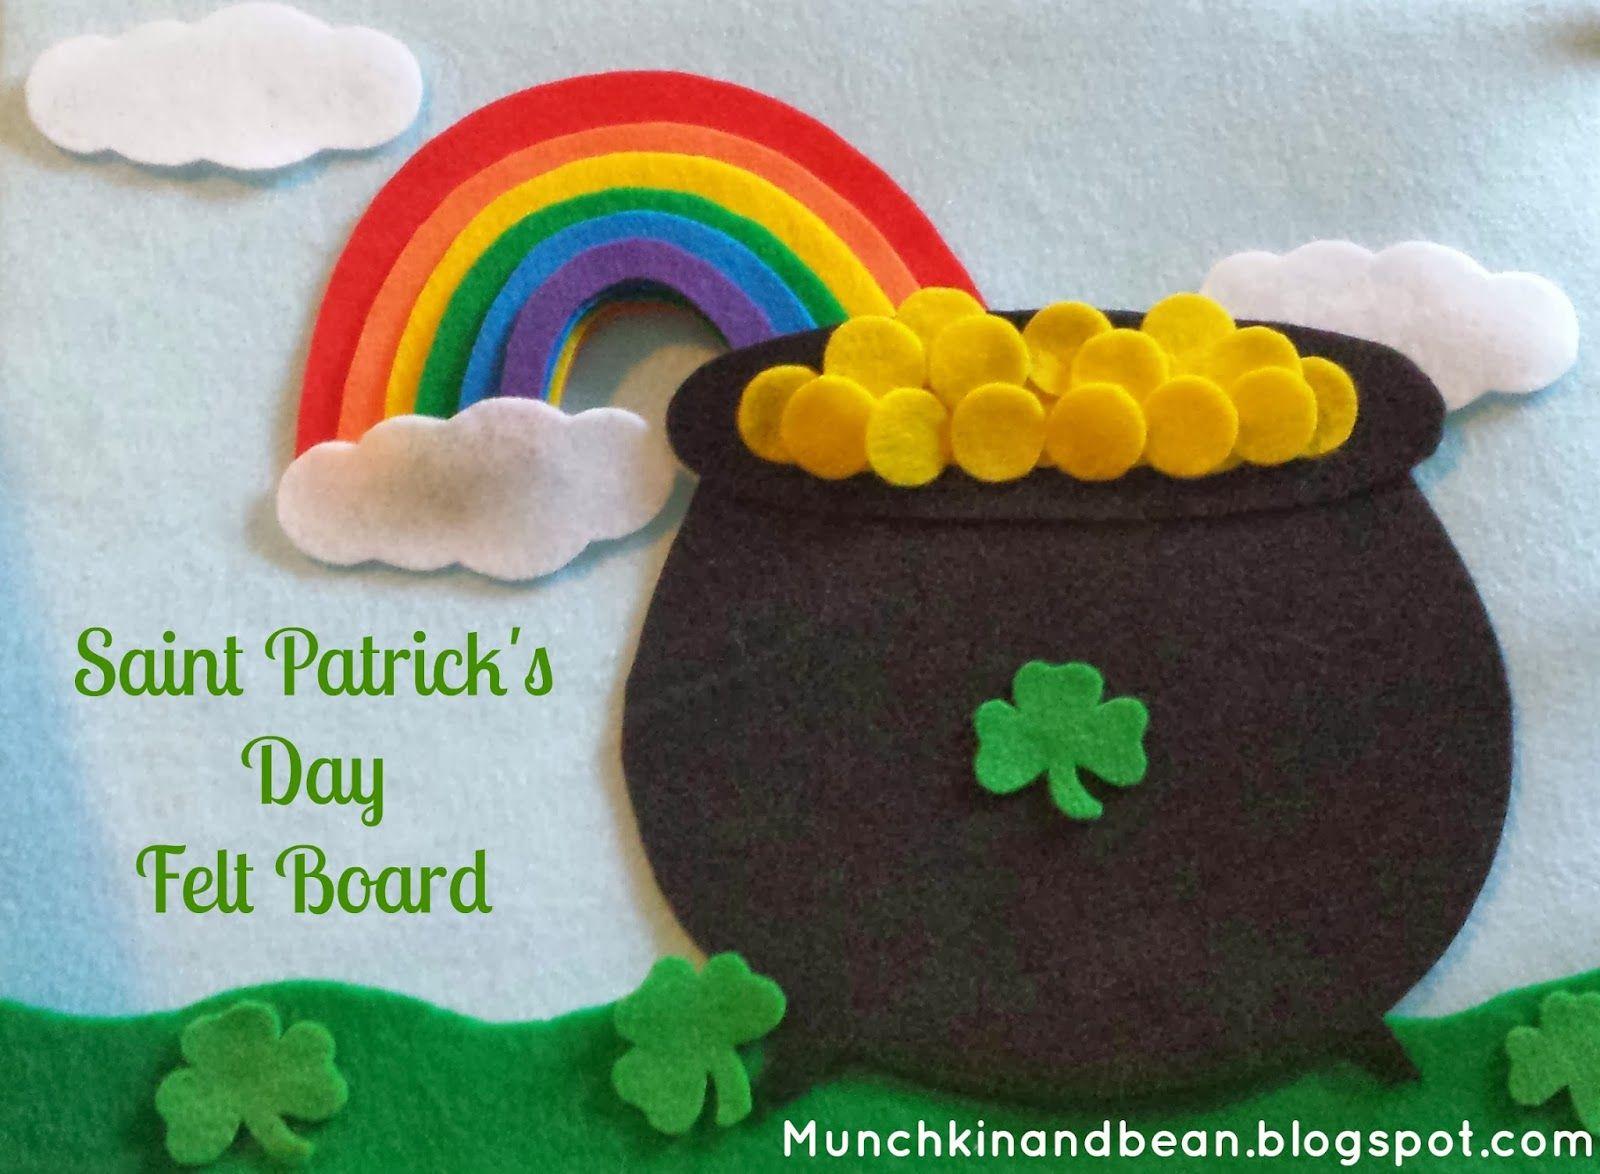 60 St Patrick S Day Activities Preschool And Kindergarten Community St Patricks Crafts St Patrick S Day Crafts Felt Board [ 1174 x 1600 Pixel ]